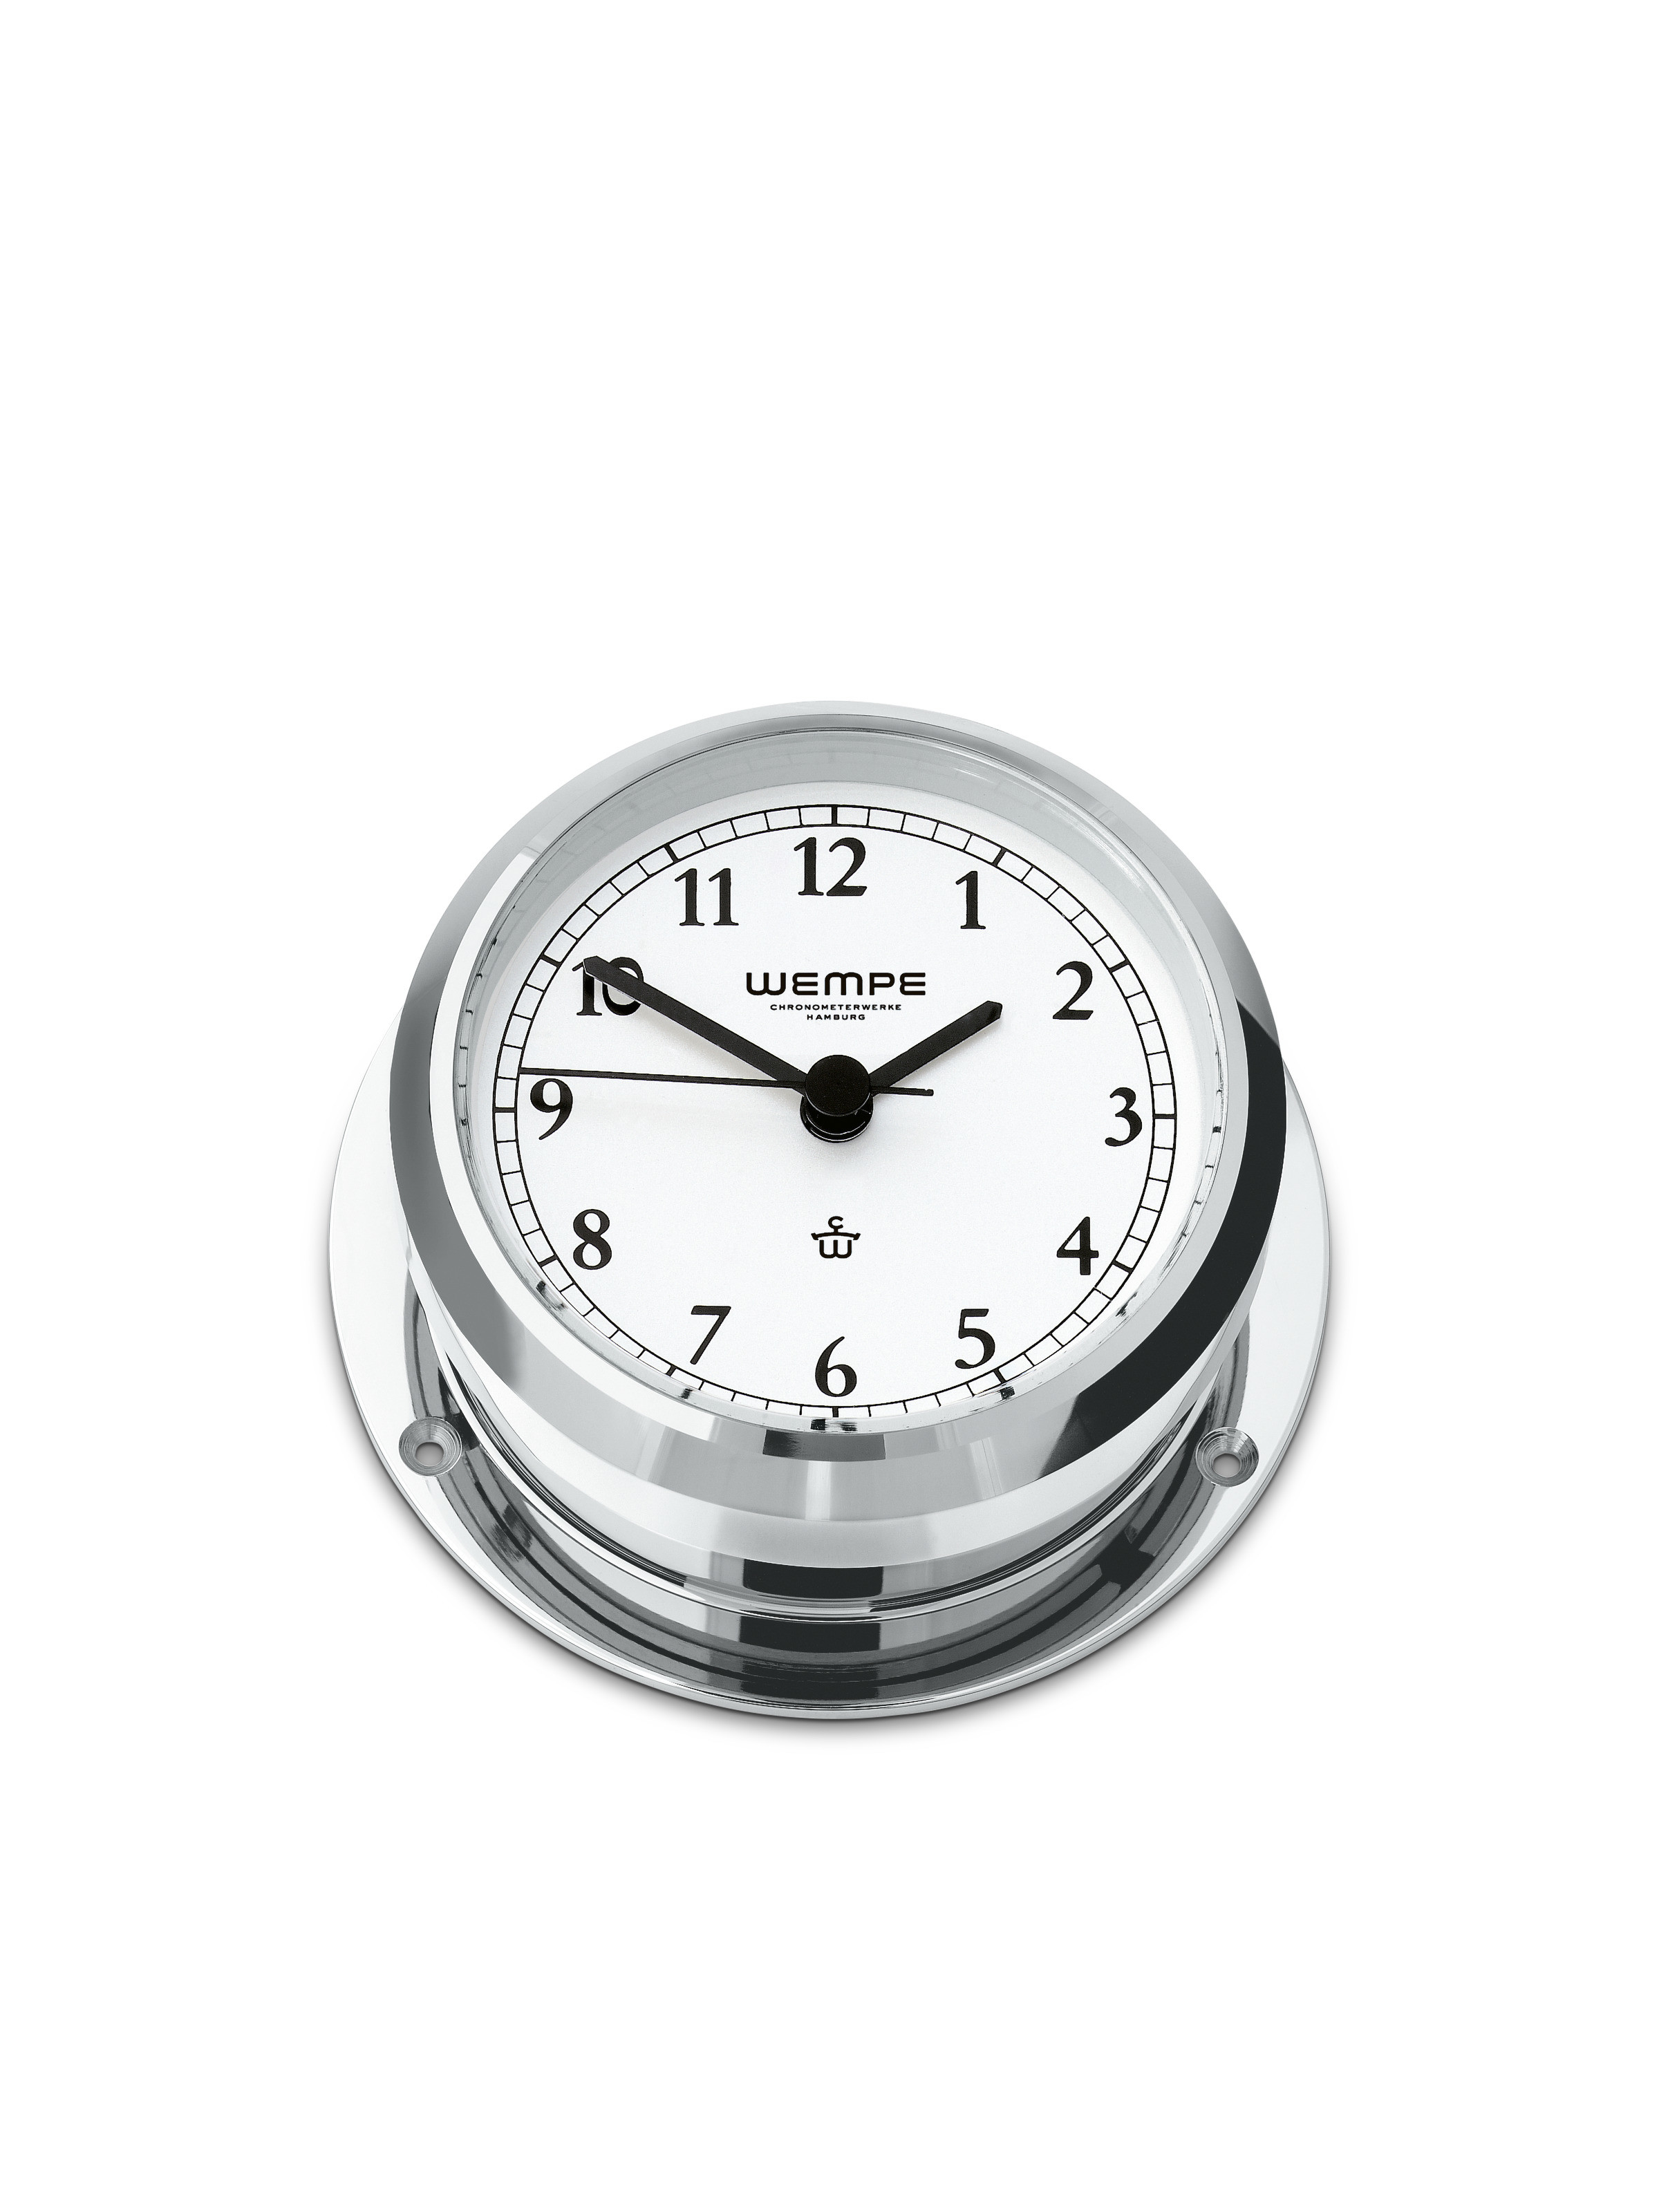 Ship's clock PIRAT II Chrome-plated brass